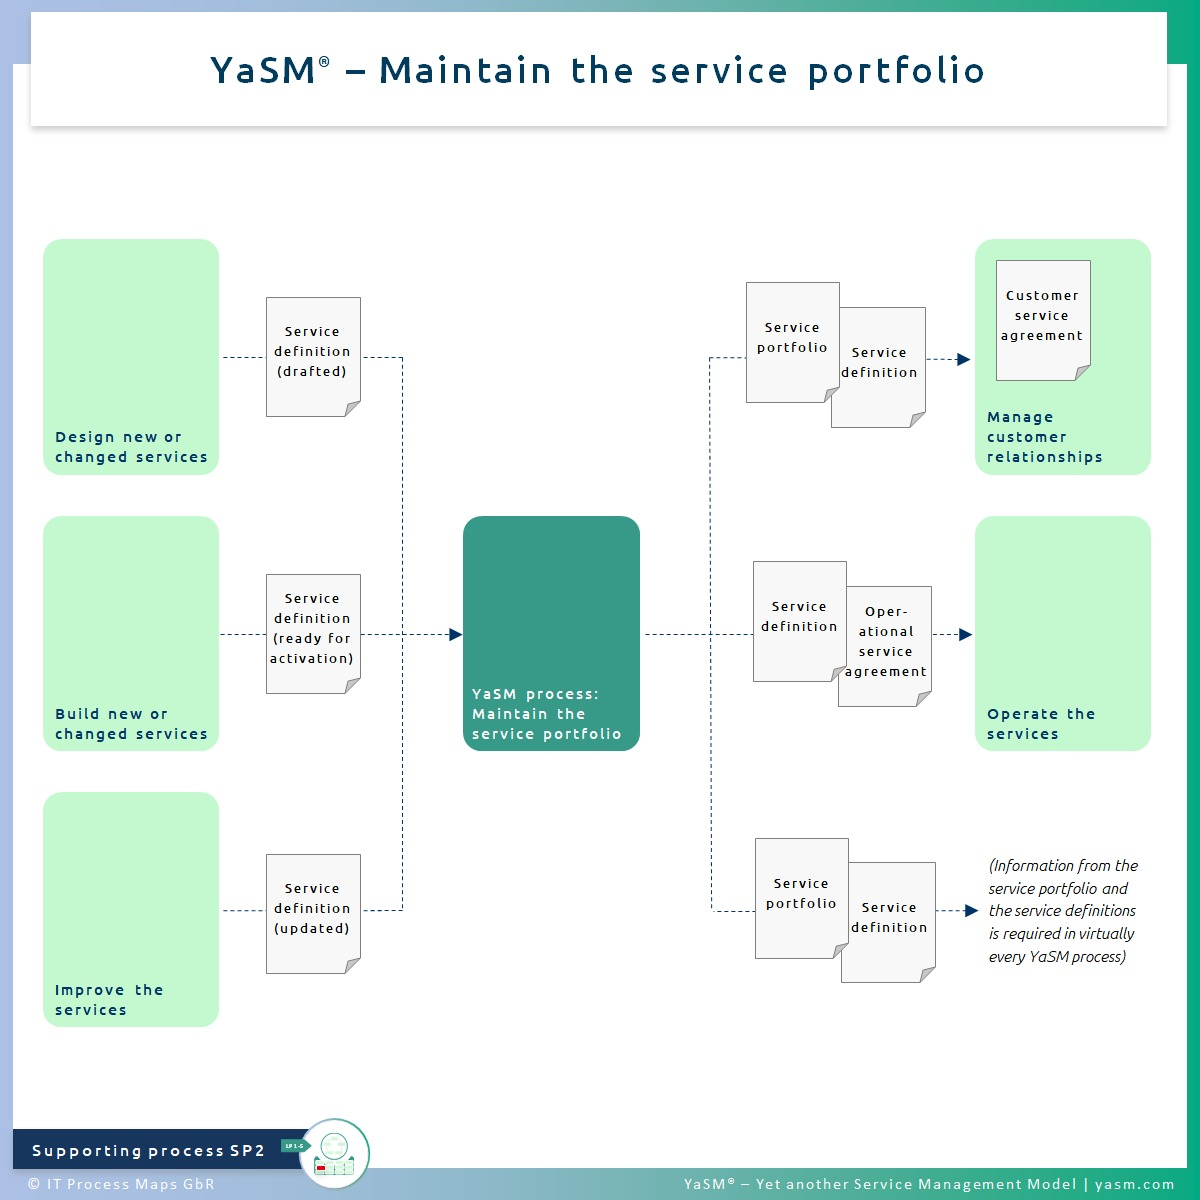 Fig. 1: Maintain the service portfolio. - YaSM service portfolio management process SP2. - Related with: Practices of ITIL 4 portfolio management and ITIL 4 service catalogue management.